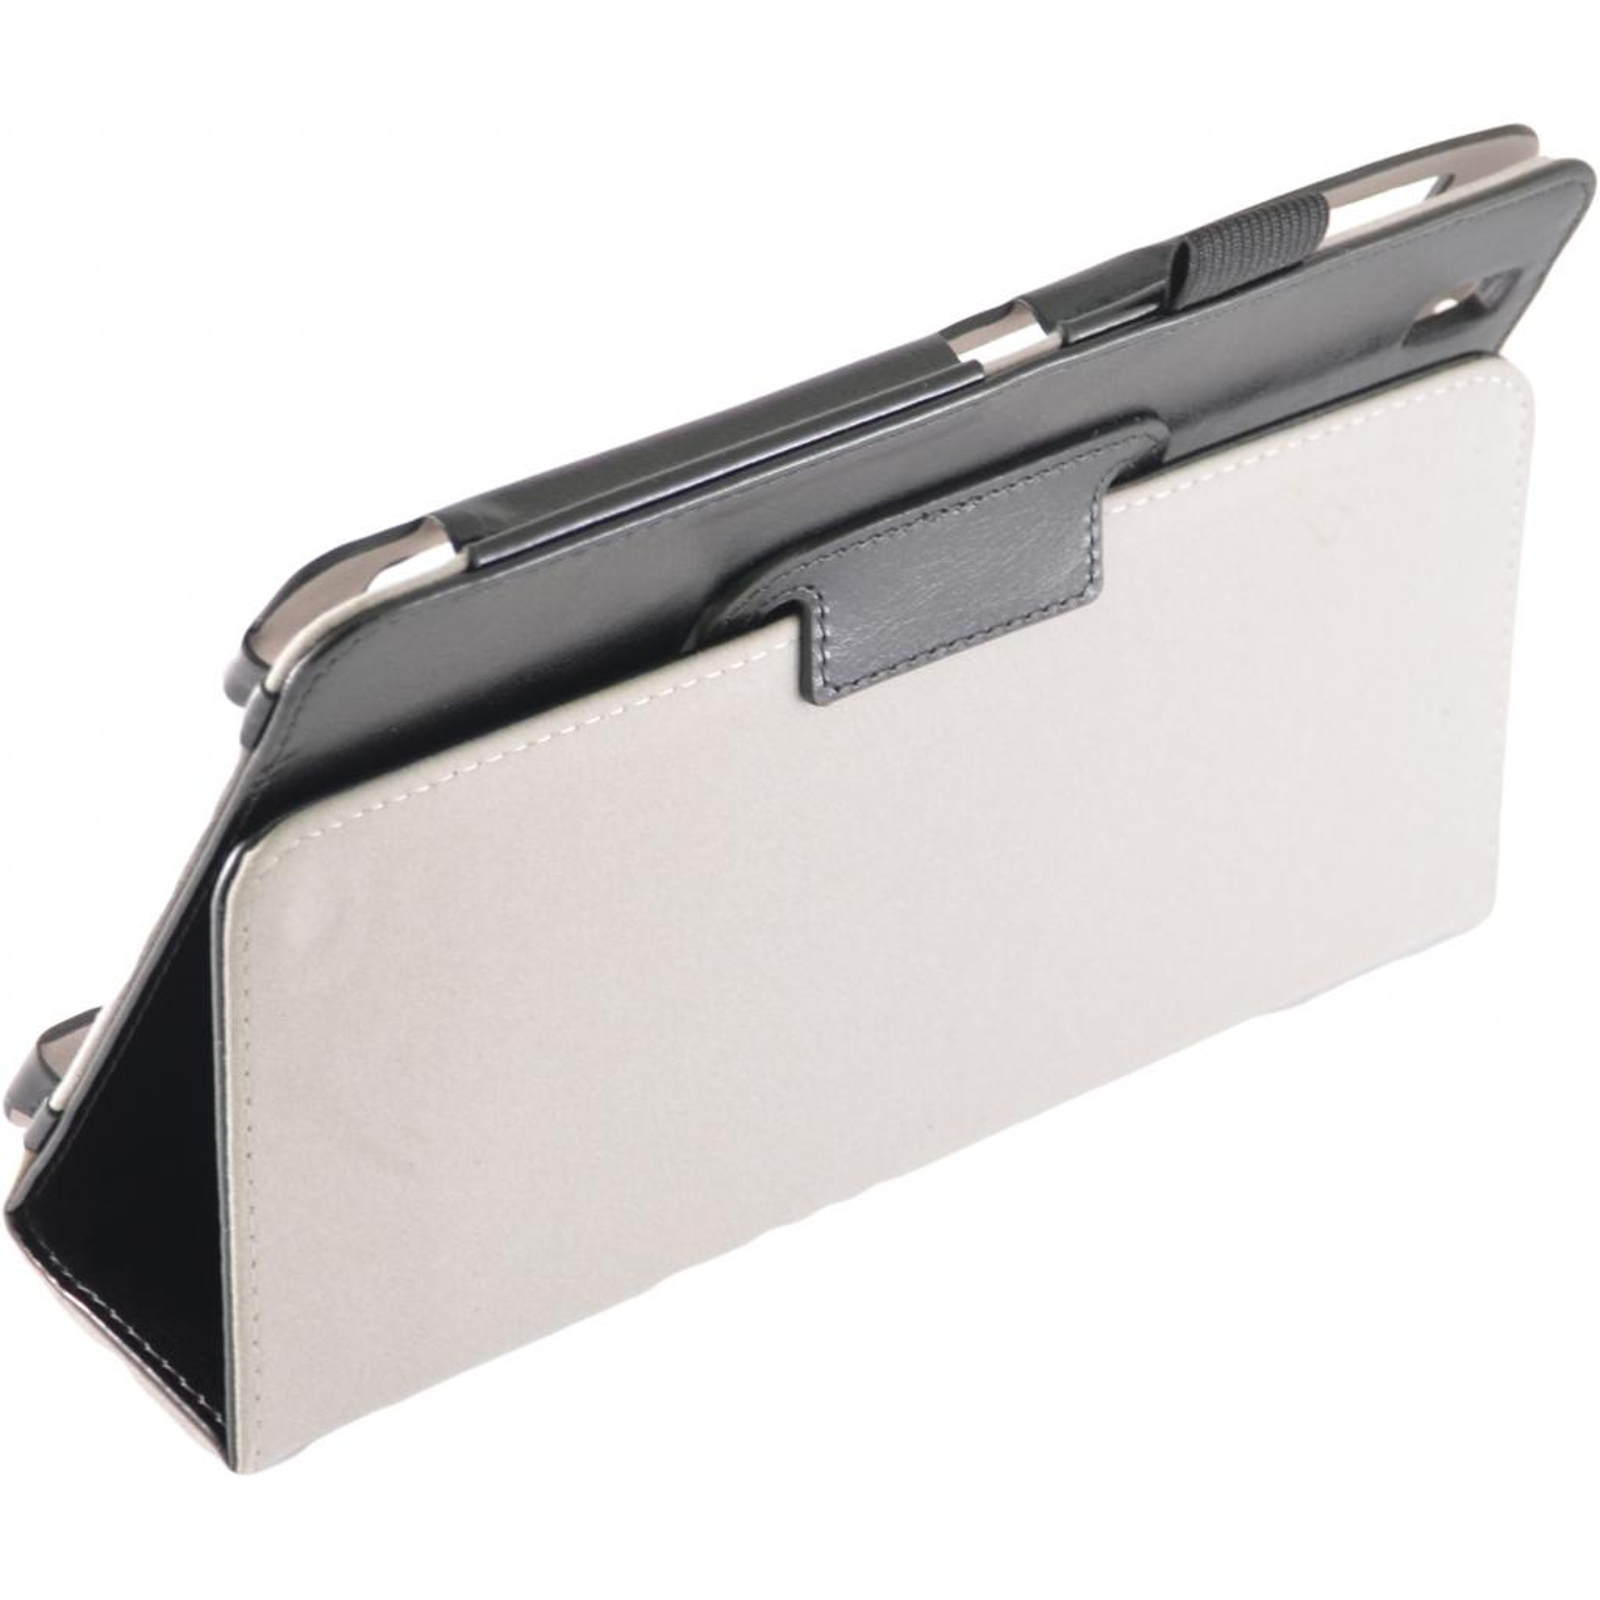 "Чехол для планшета Pro-case GALAXY Tab Pro 8.4"" T320 (Tab Pro 8.4"") изображение 4"